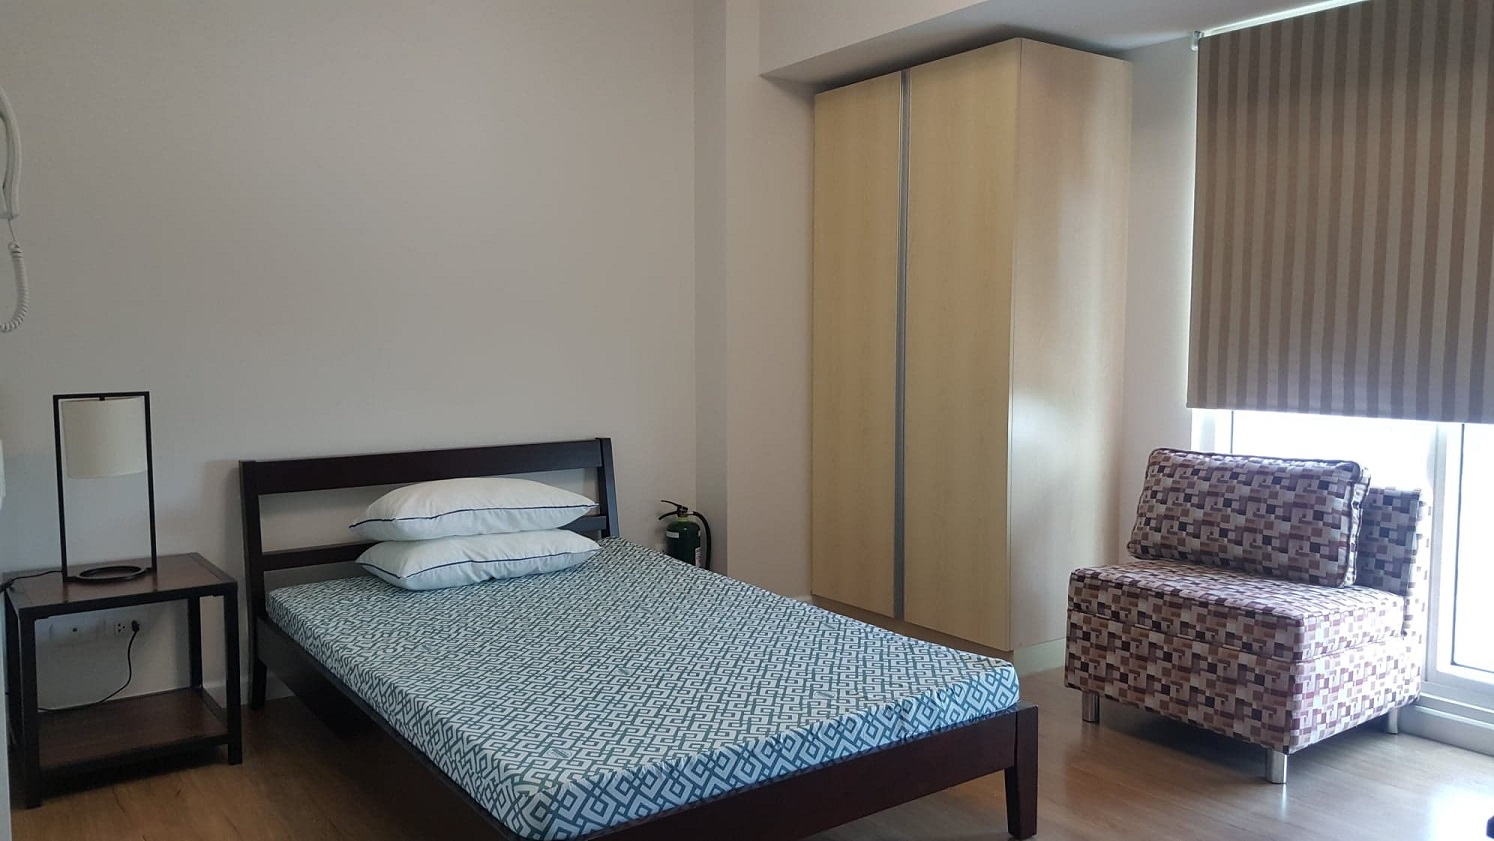 studio-type-condominium-located-near-ayala-mall-business-park-cebu-city